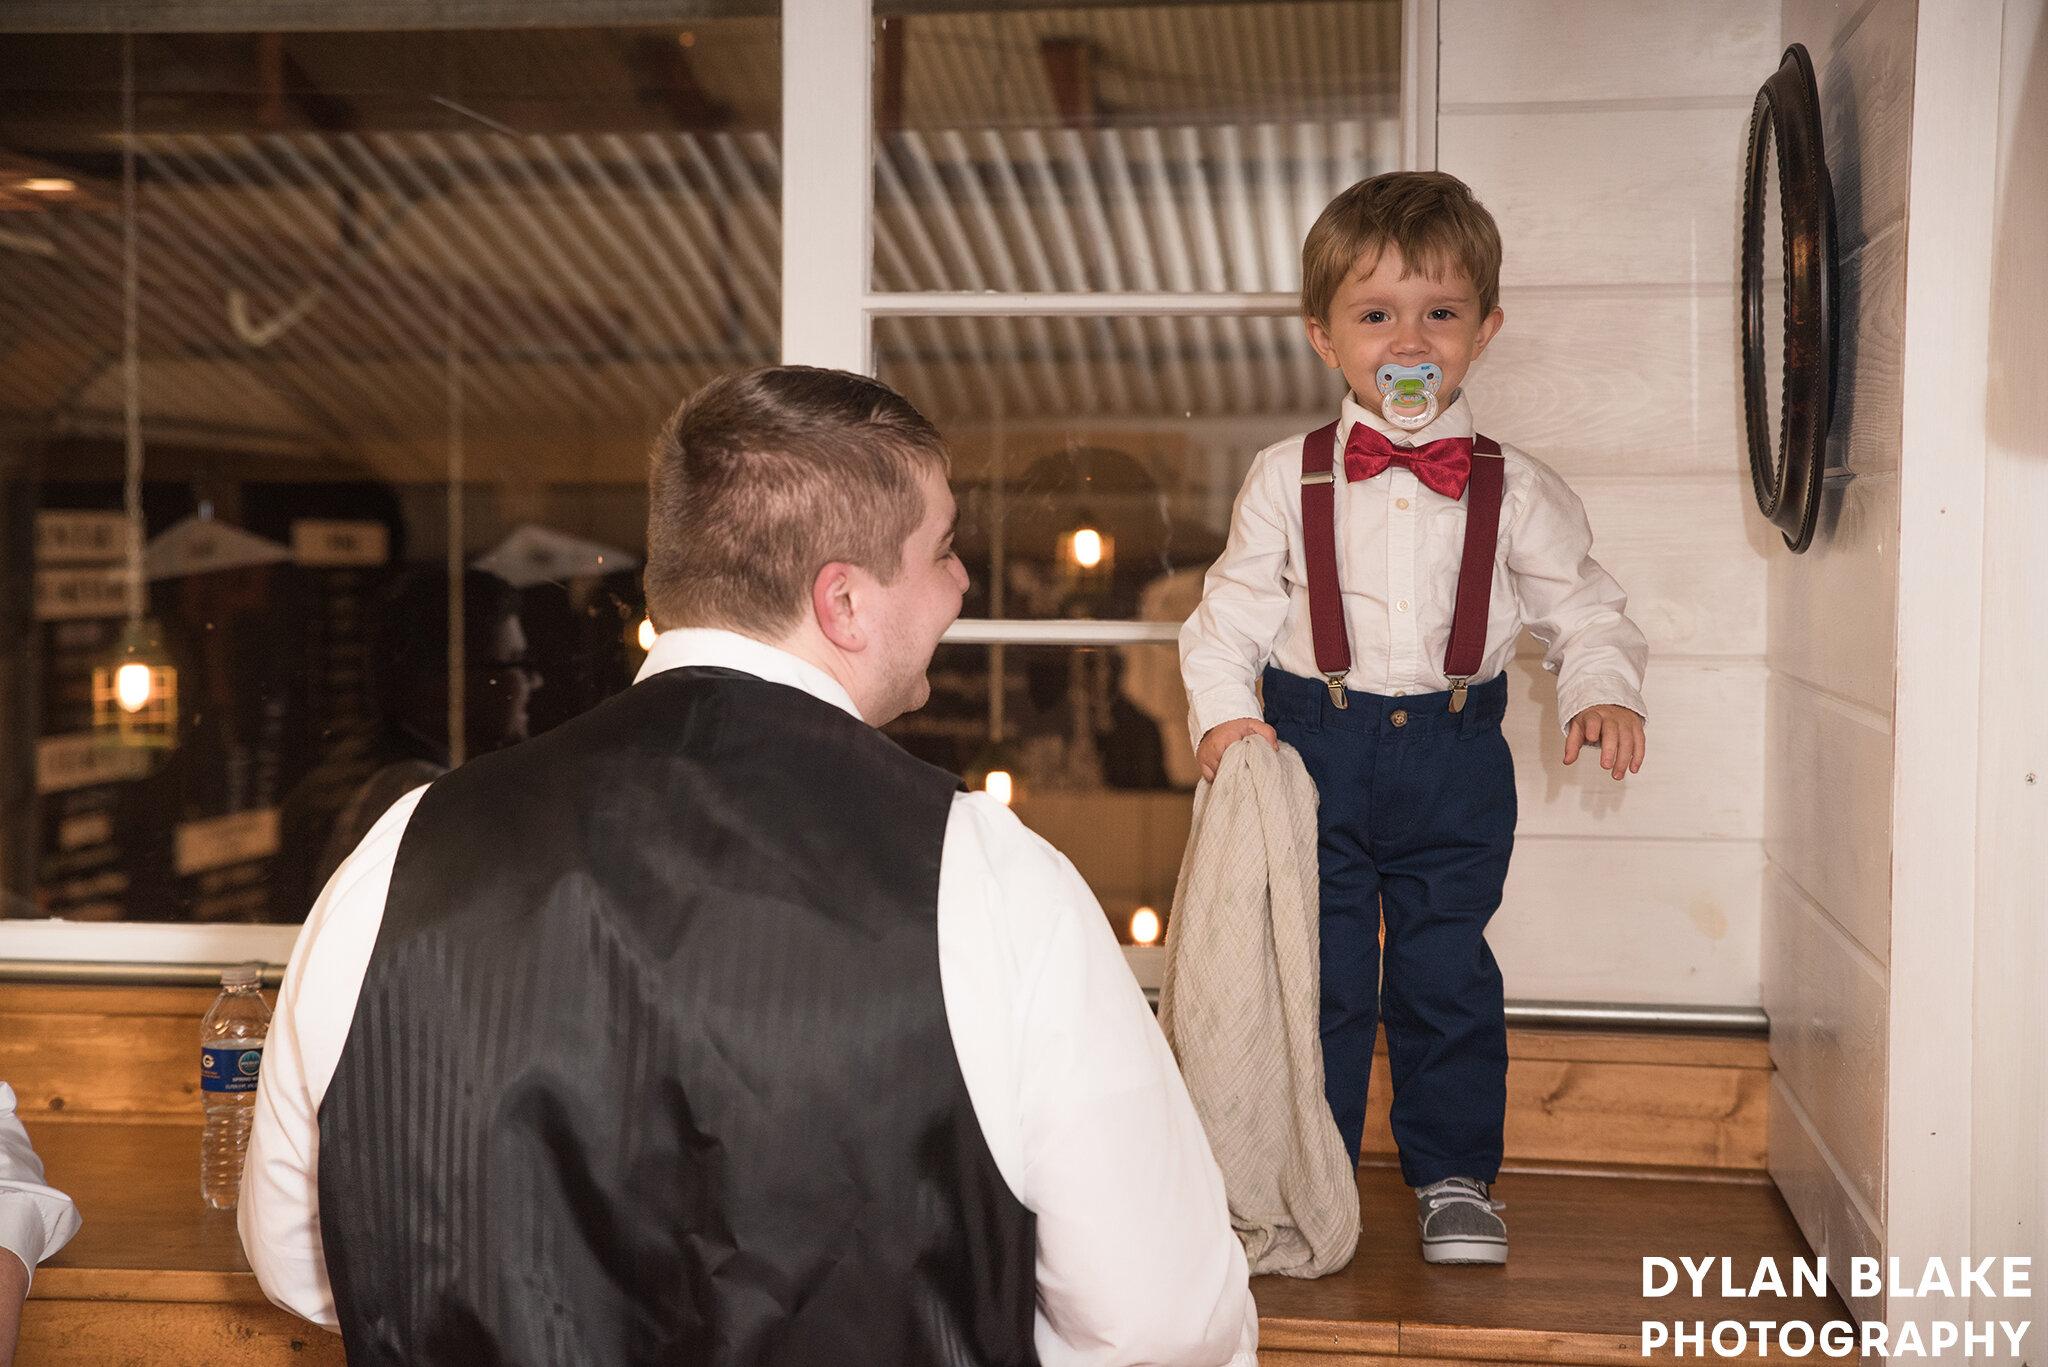 ryan-and-billy-brighton-acres-wedding0006.jpg